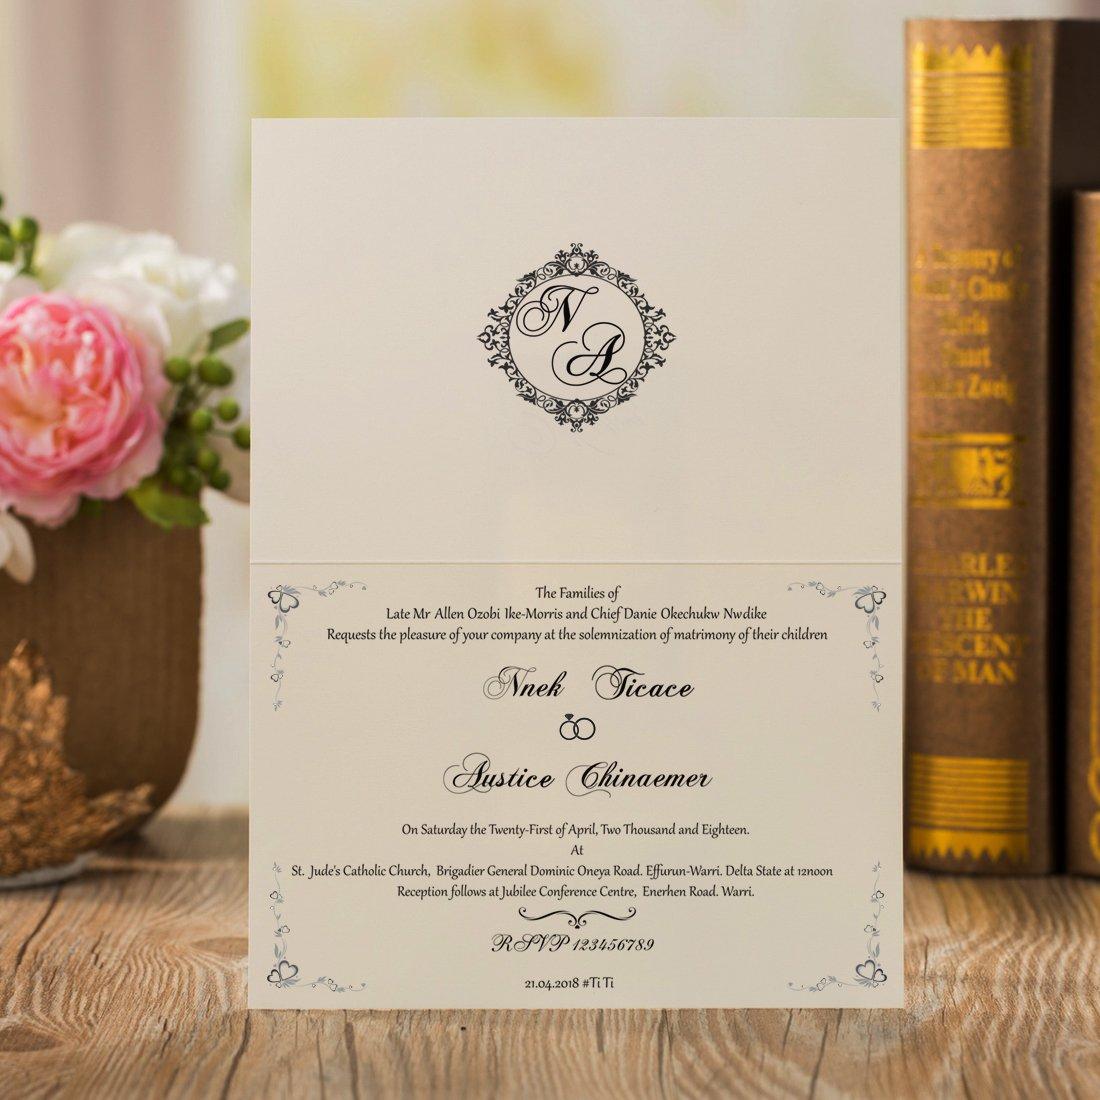 Wishmade Vintage Laser Cut Wedding Invitations Cards Blue 50 Pieces